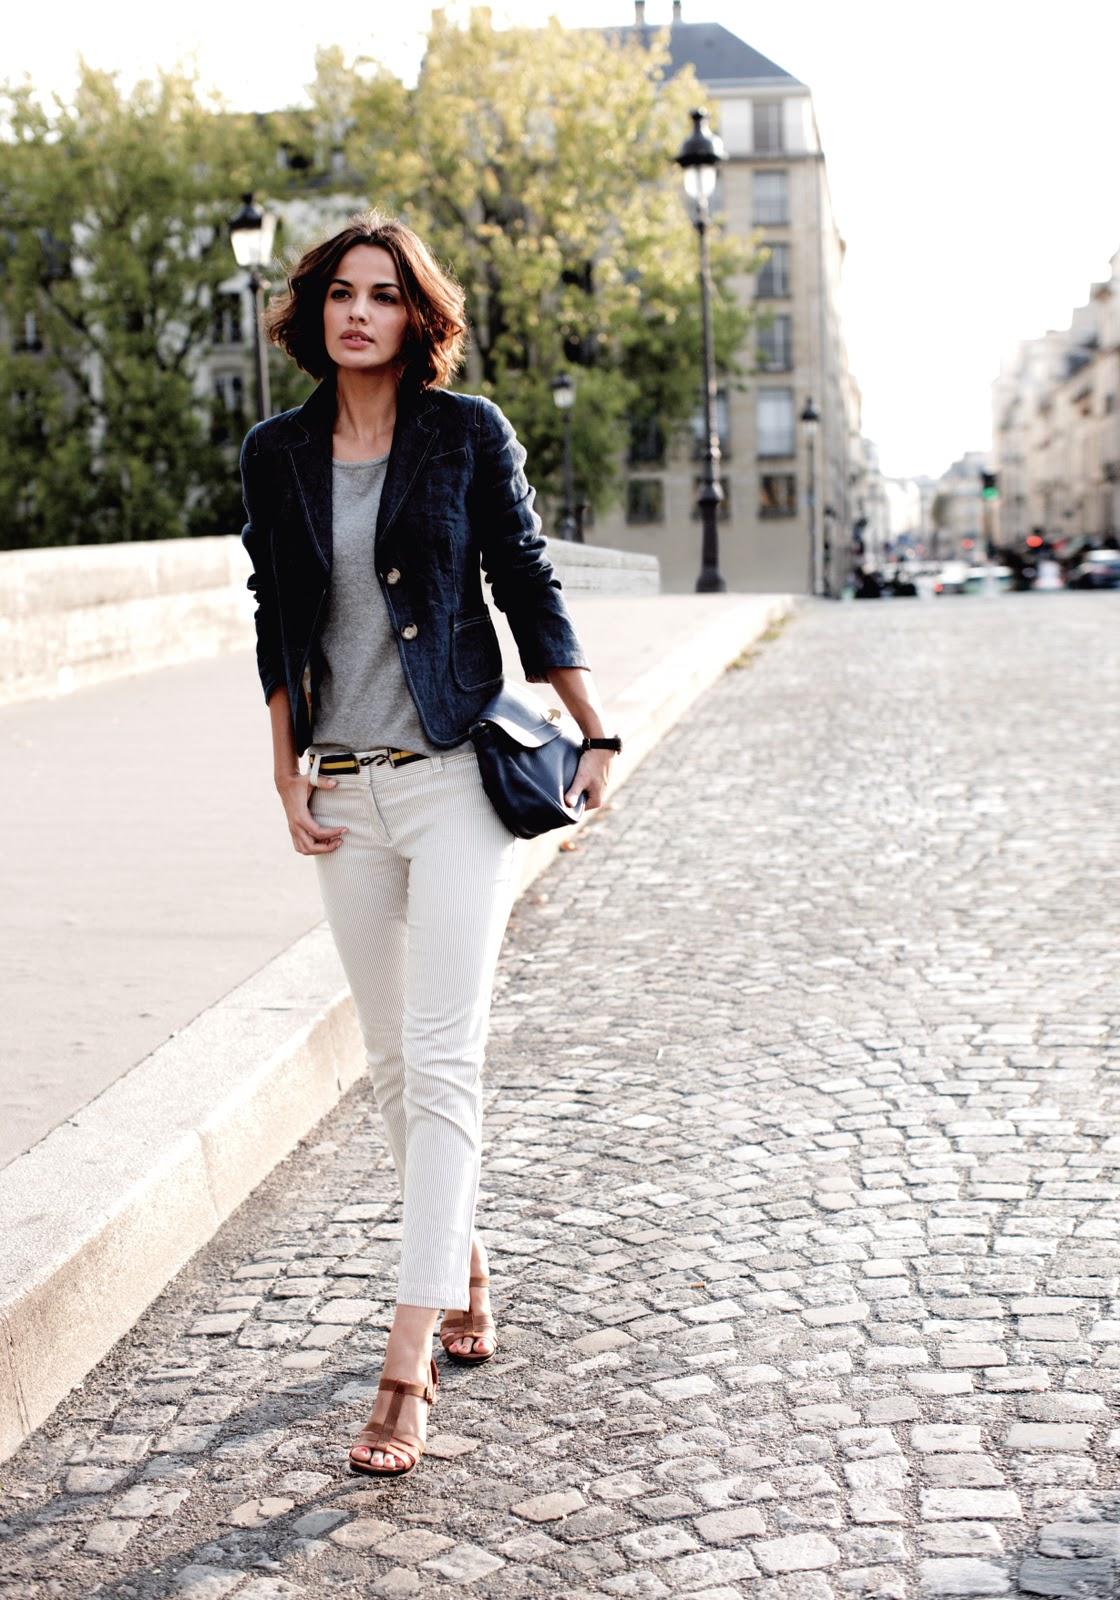 http://3.bp.blogspot.com/-A5JaCxYXqeo/T7BDOsQGSmI/AAAAAAAAsoA/jqaEcZSO80I/s1600/11.1+Boden+white+jeans.jpg